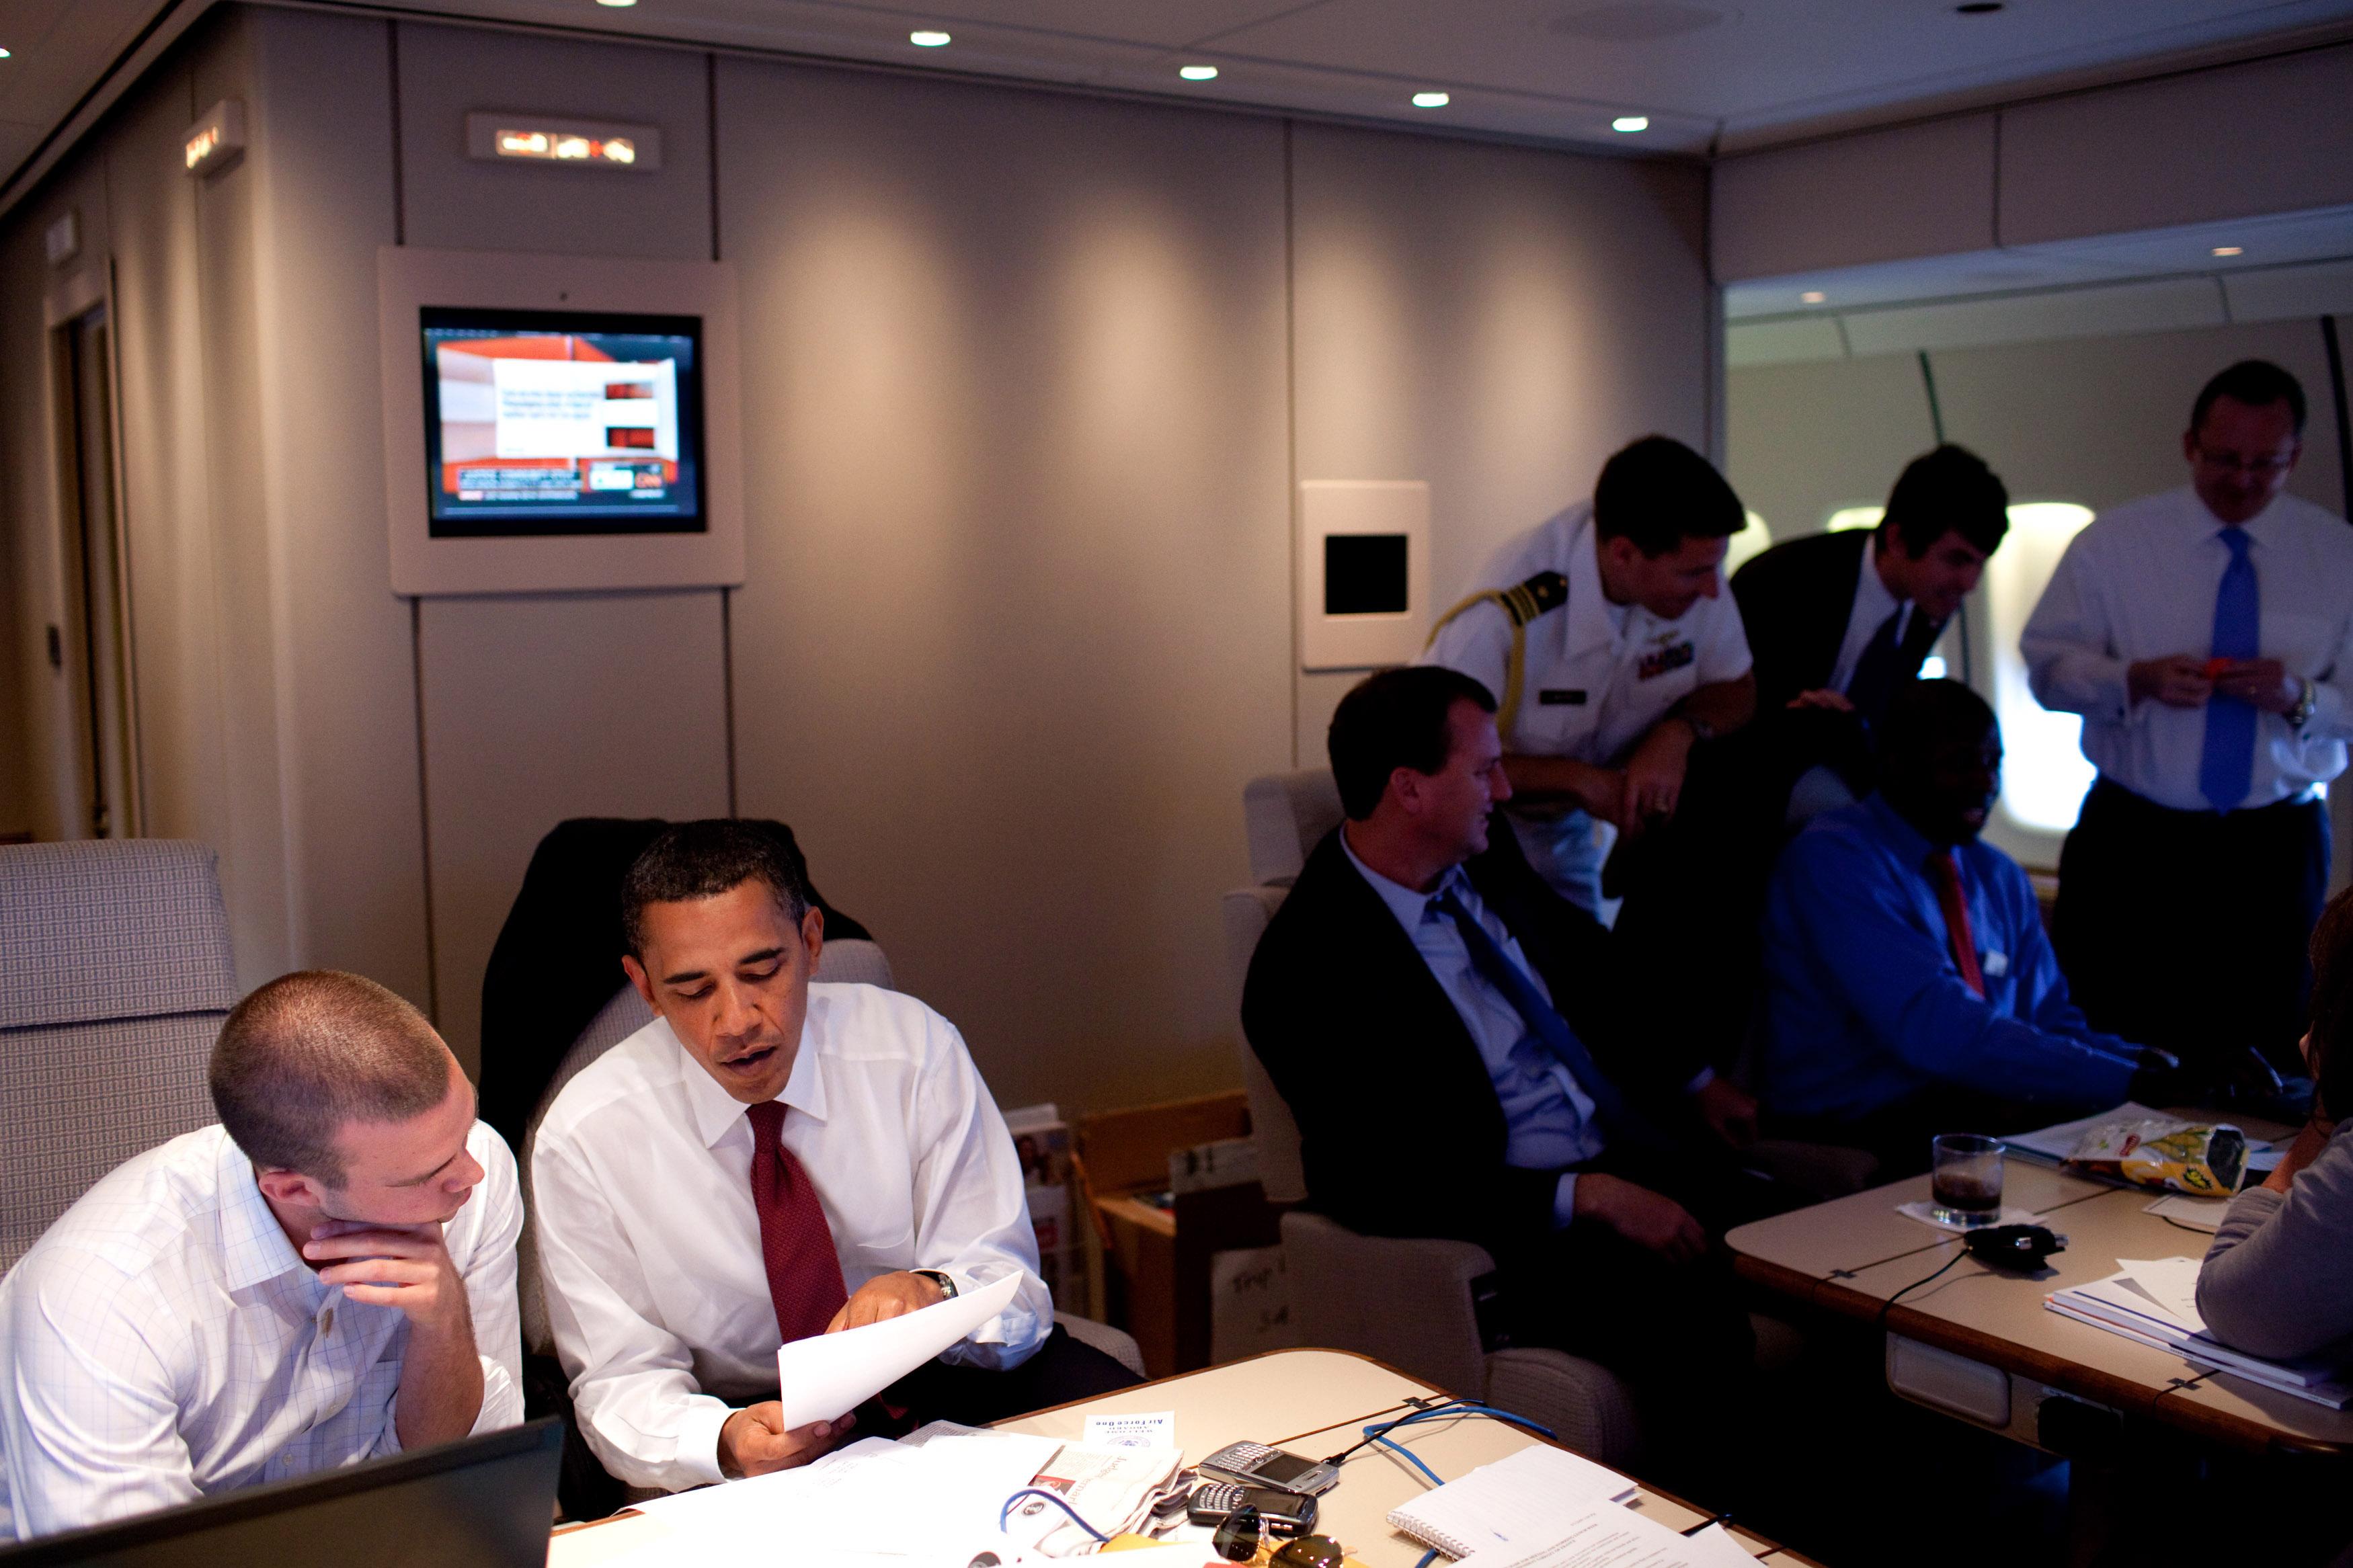 Description Barack Obama and Jon Favreau in Air Force One jpgObama Air Force One Interior